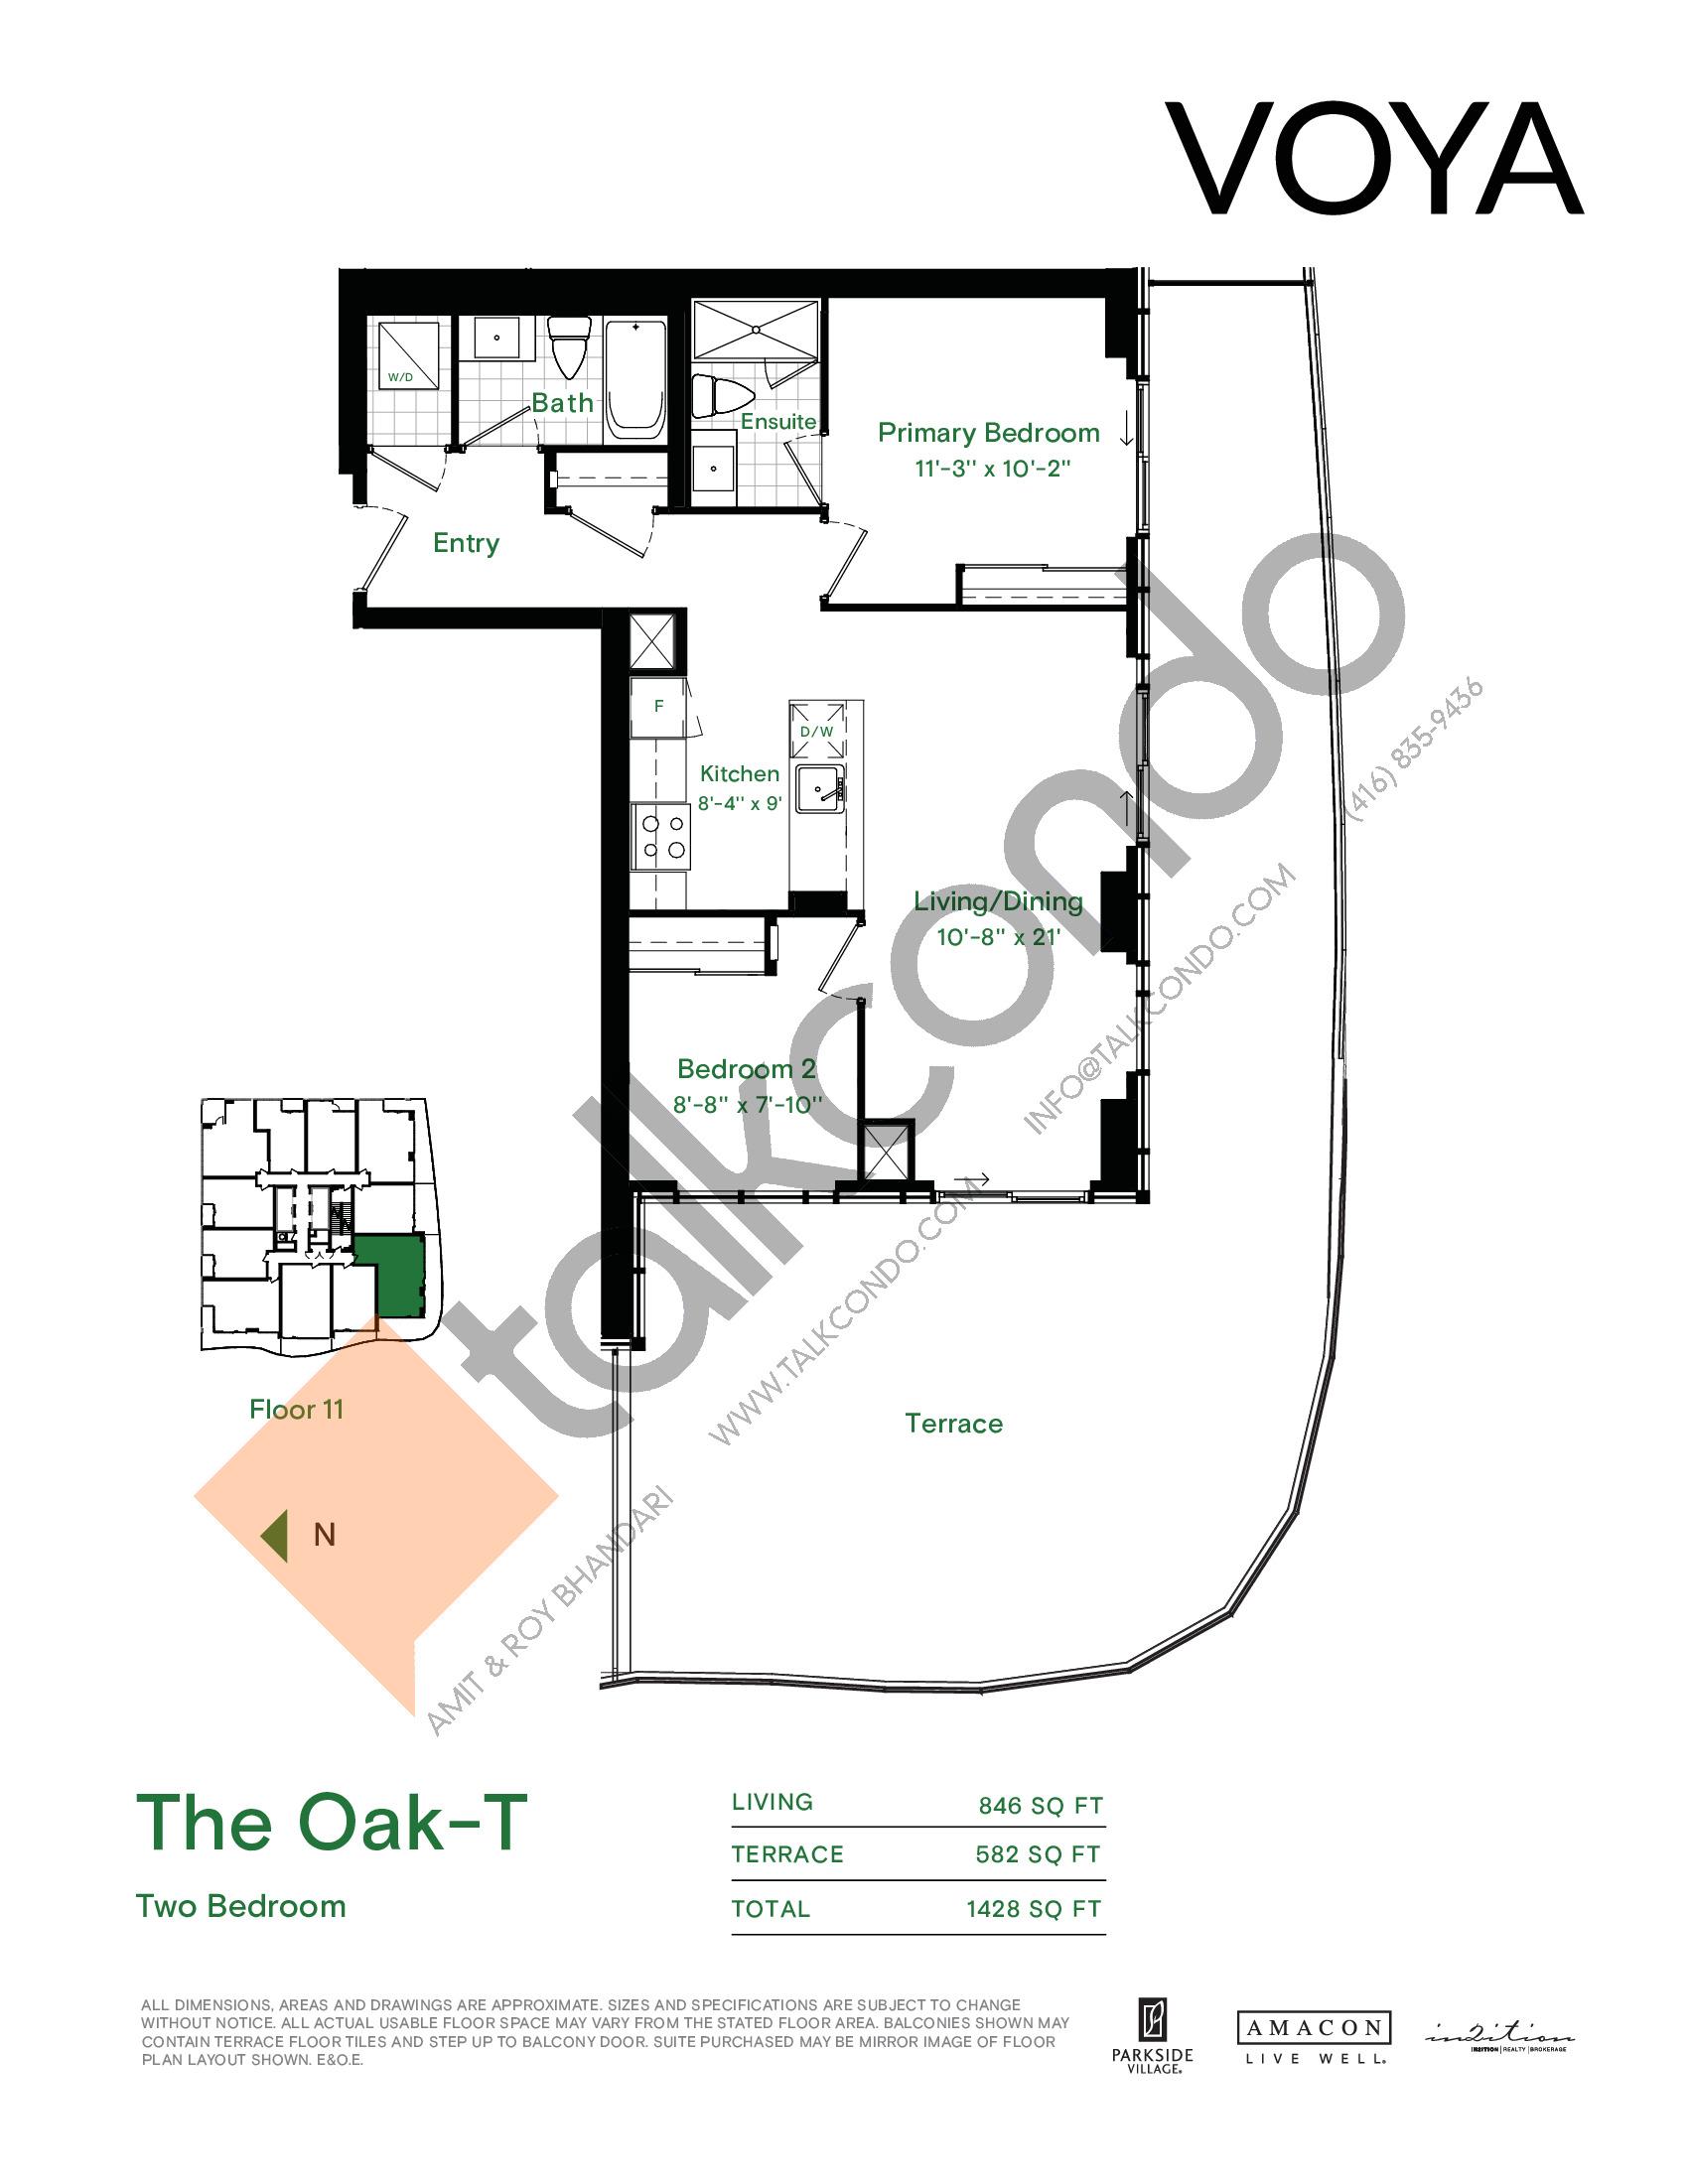 The Oak-T Floor Plan at Voya at Parkside Village Condos - 846 sq.ft